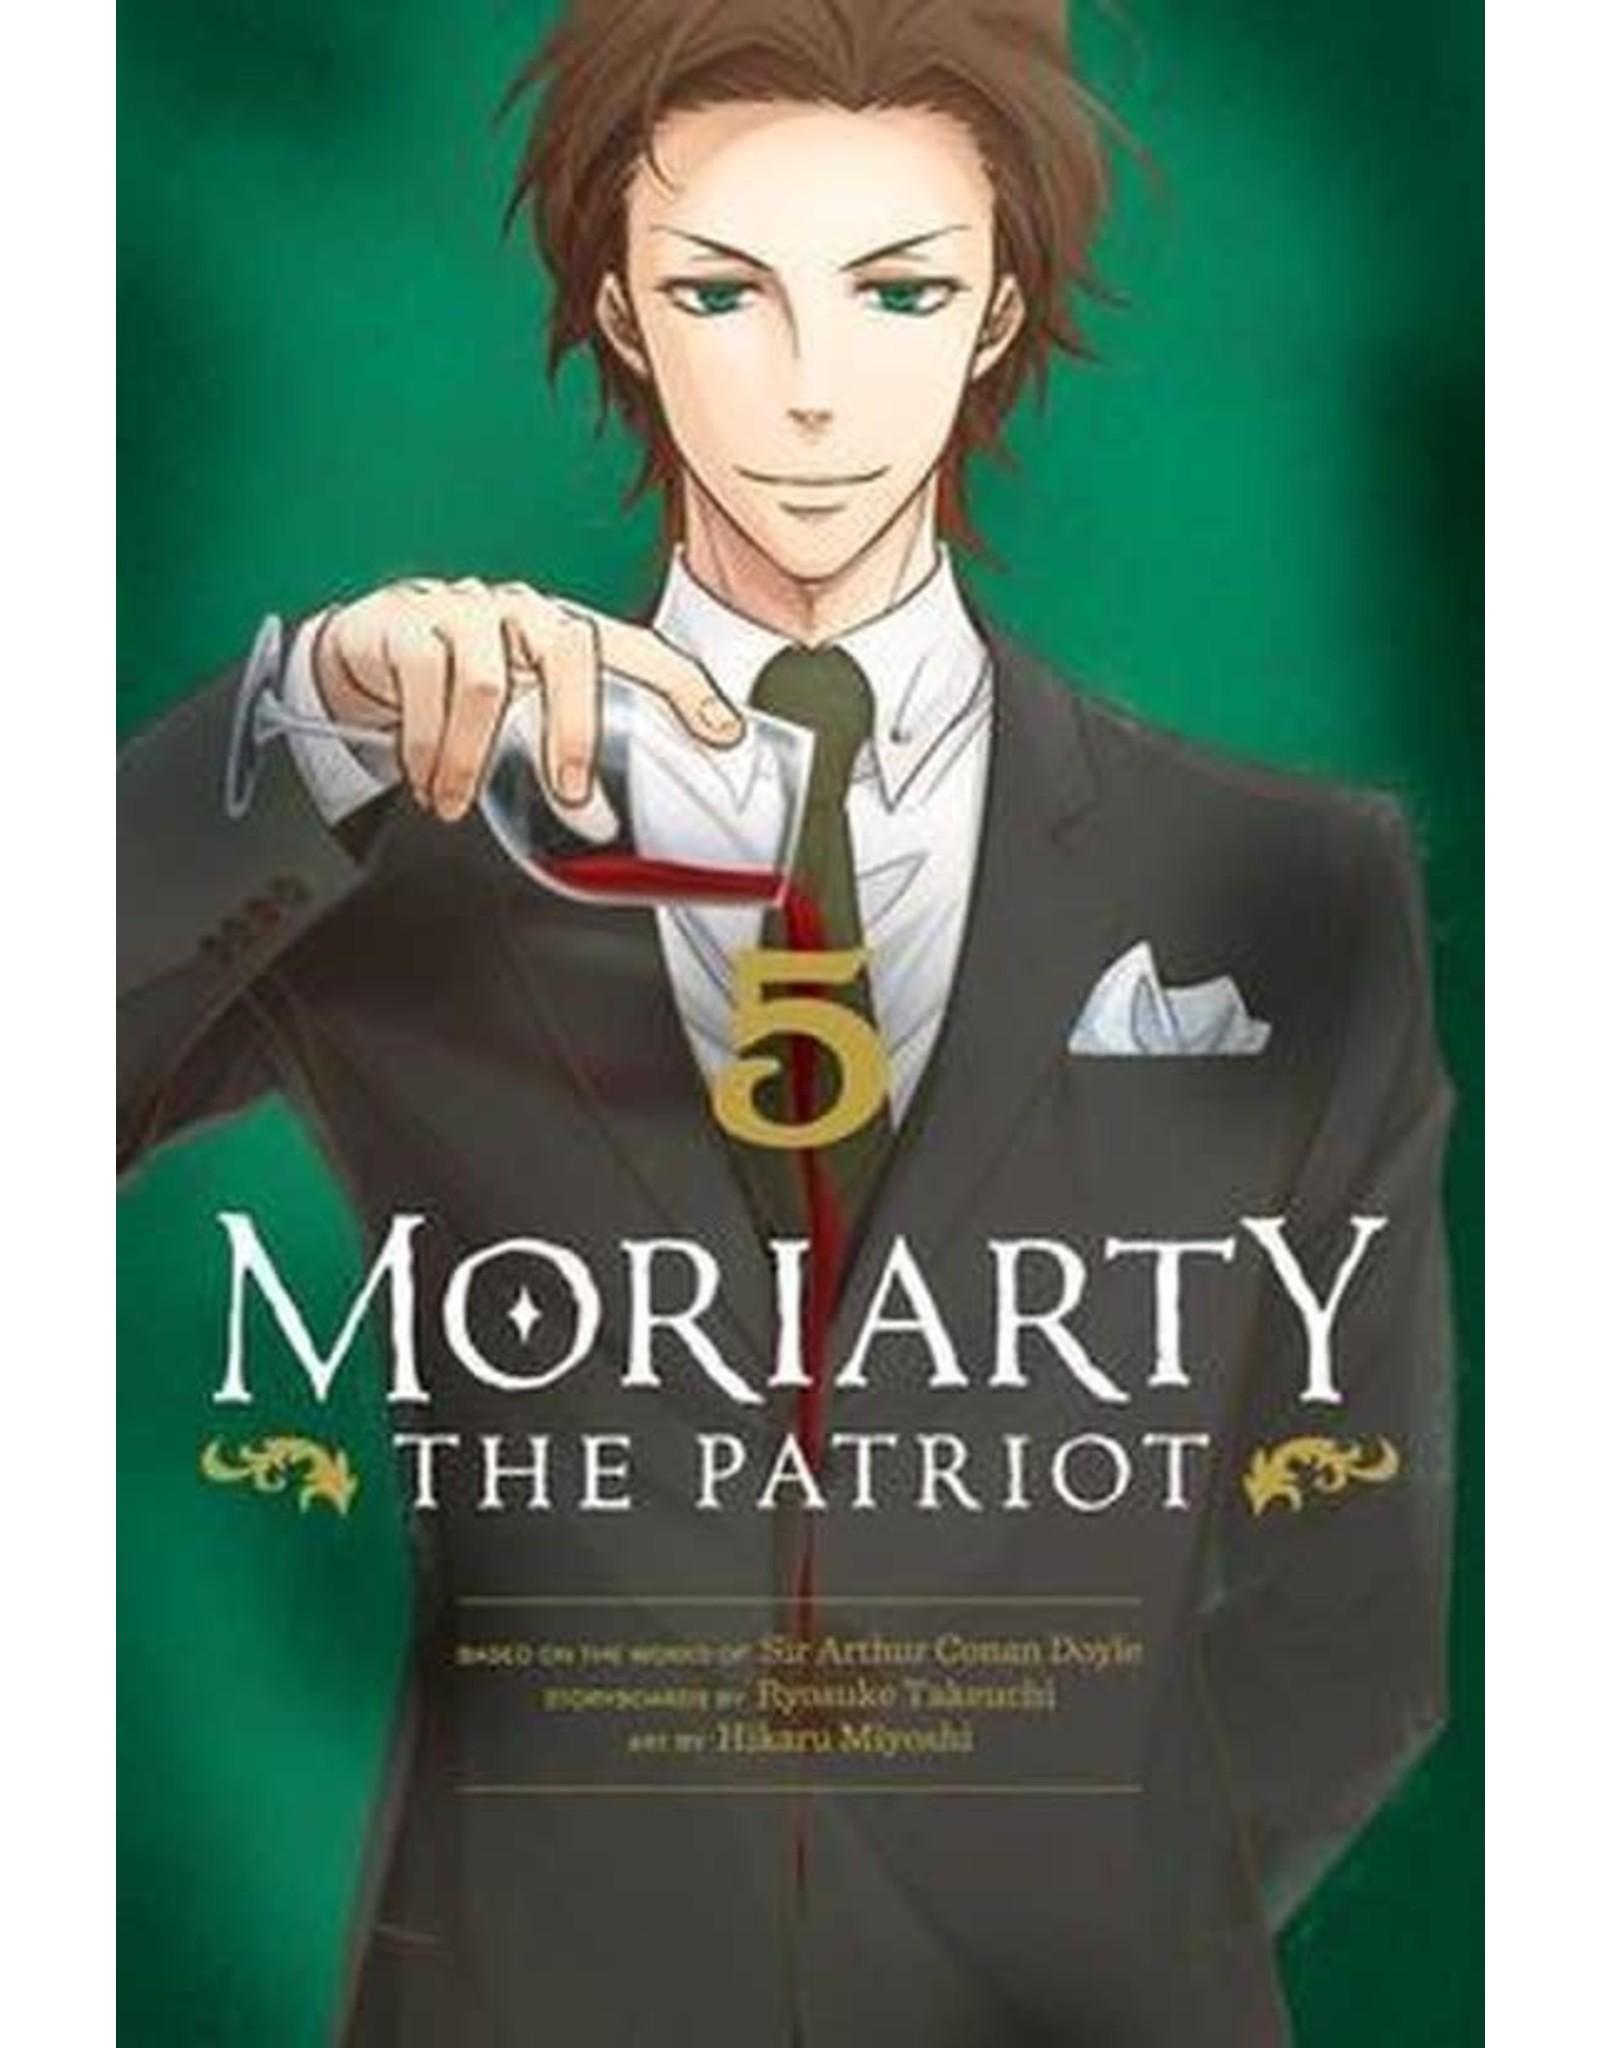 Moriarty The Patriot 5 (Engelstalig) - Manga